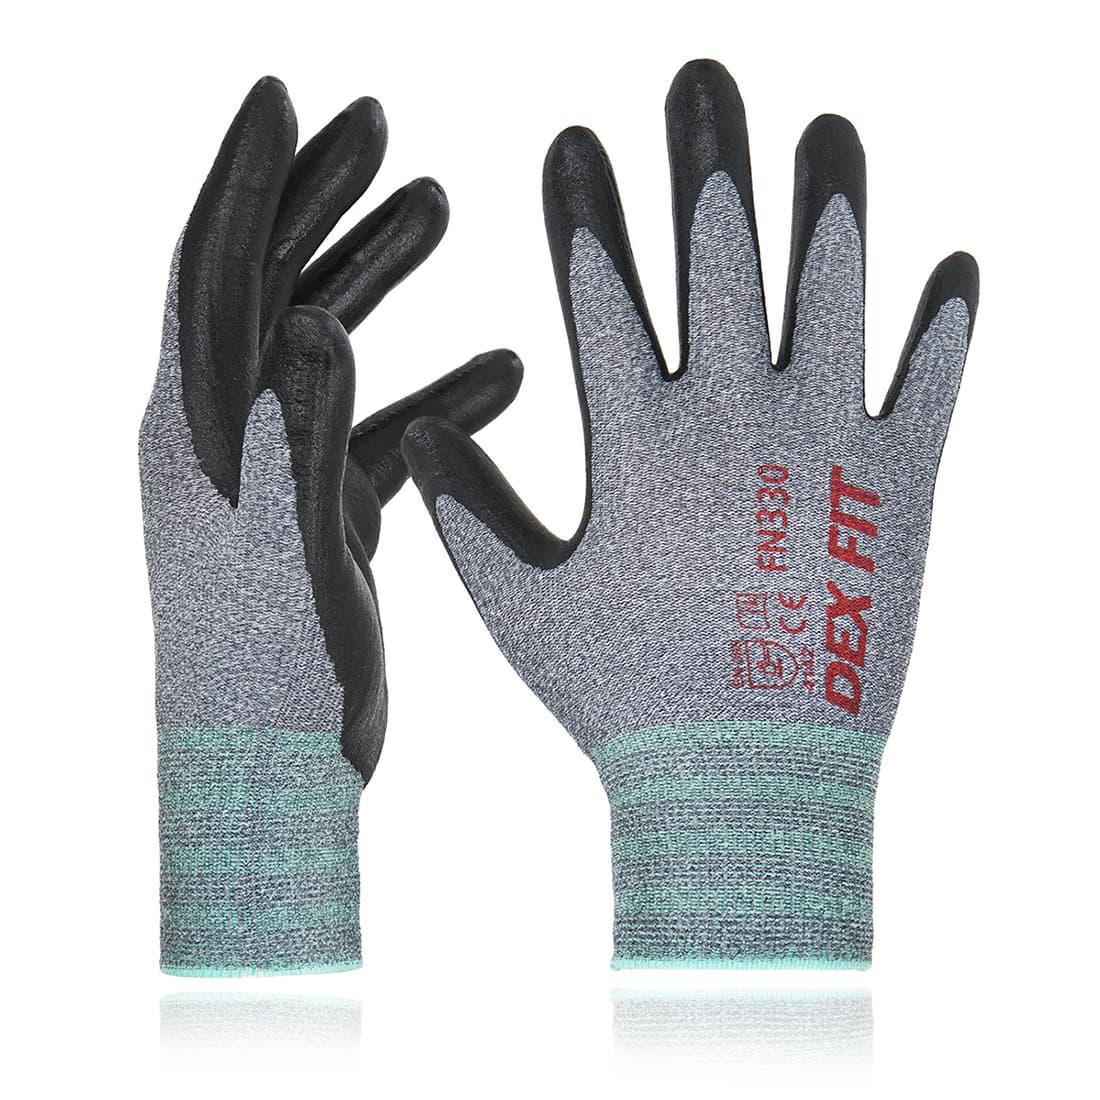 Nitrile Work Gloves FN330